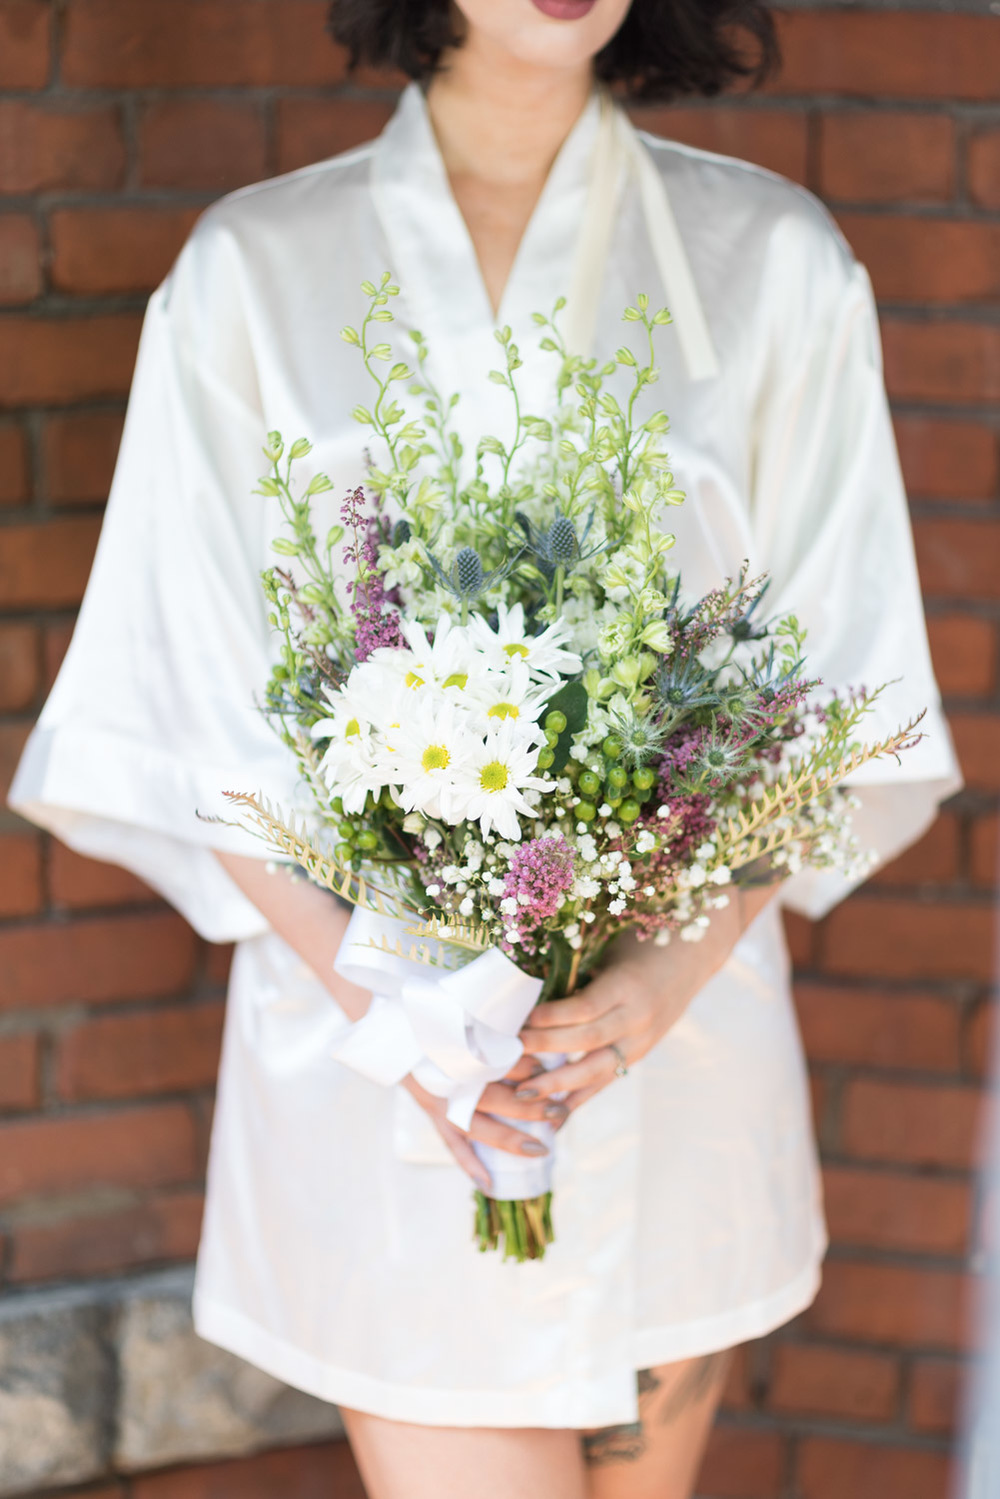 S&M_TORONTO_WEDDING_PHOTOGRAPHY_004.jpg